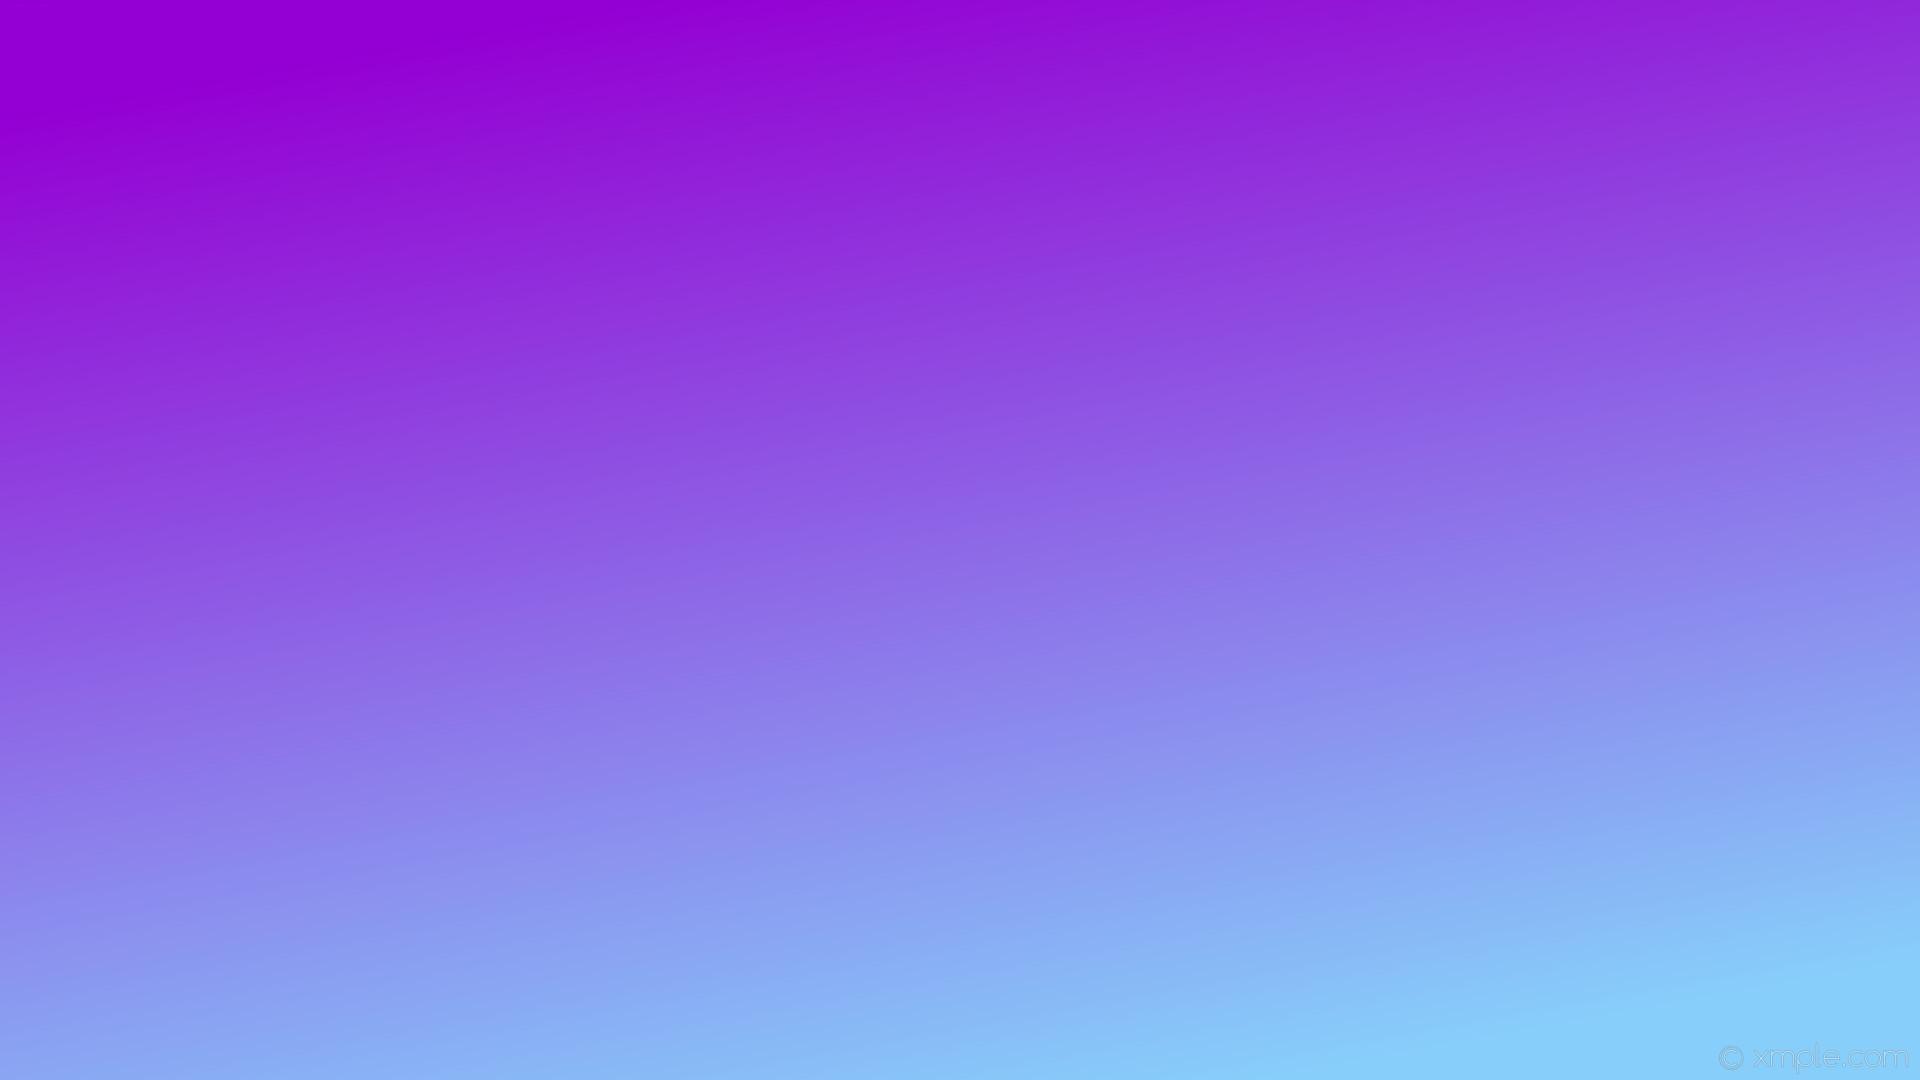 wallpaper gradient purple blue linear dark violet light sky blue #9400d3  #87cefa 120°